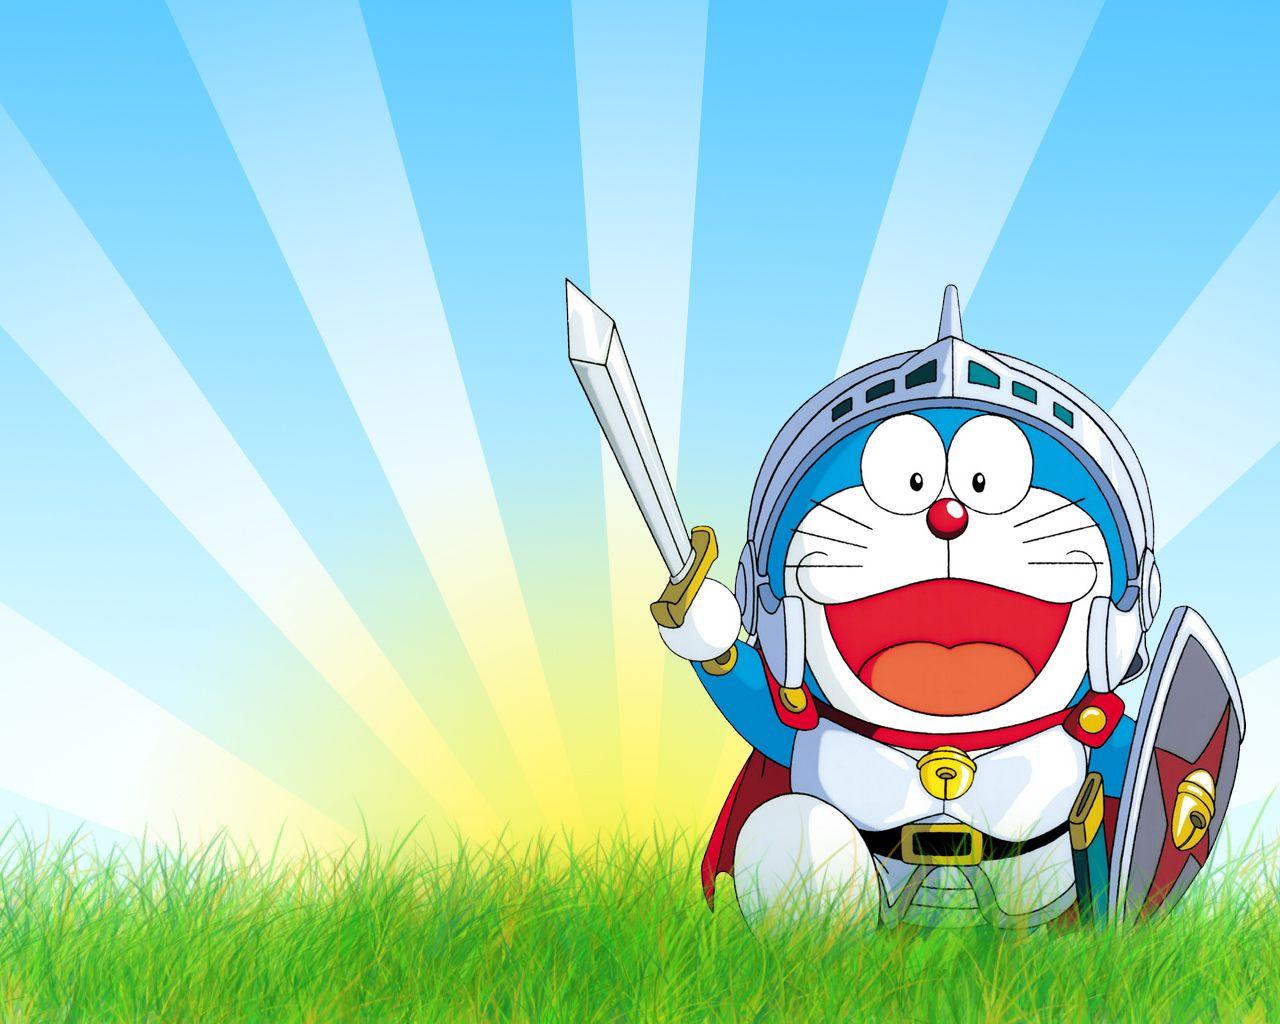 Pin by lisa Morina on HD Wall Cloud Doraemon wallpapers